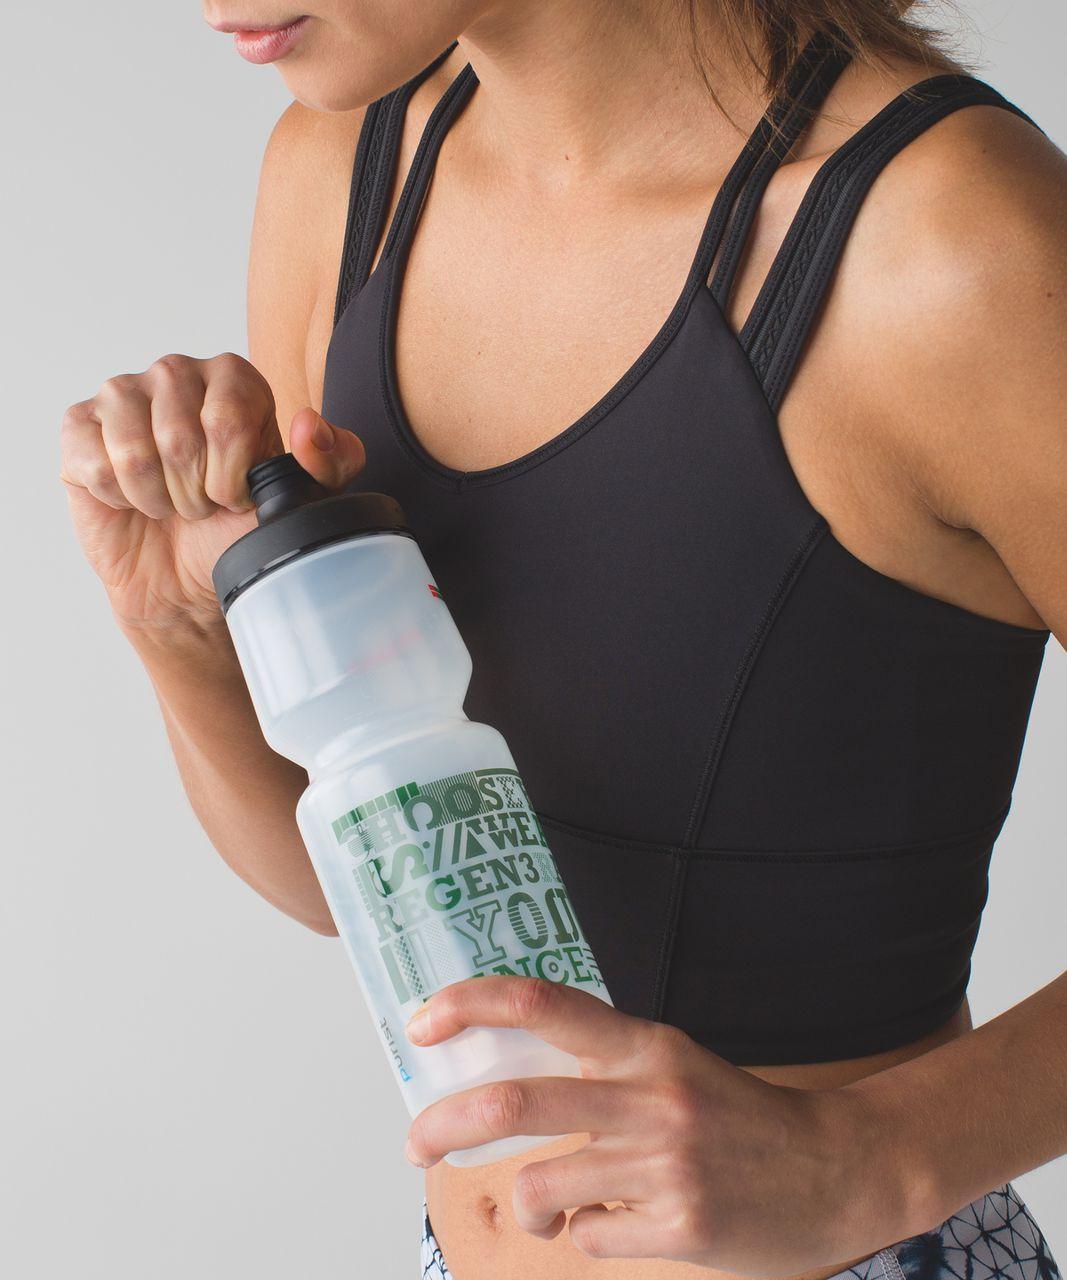 Lululemon Purist Cycling Water Bottle *26 oz - Geo Manifesto Fatigue Green Alarming